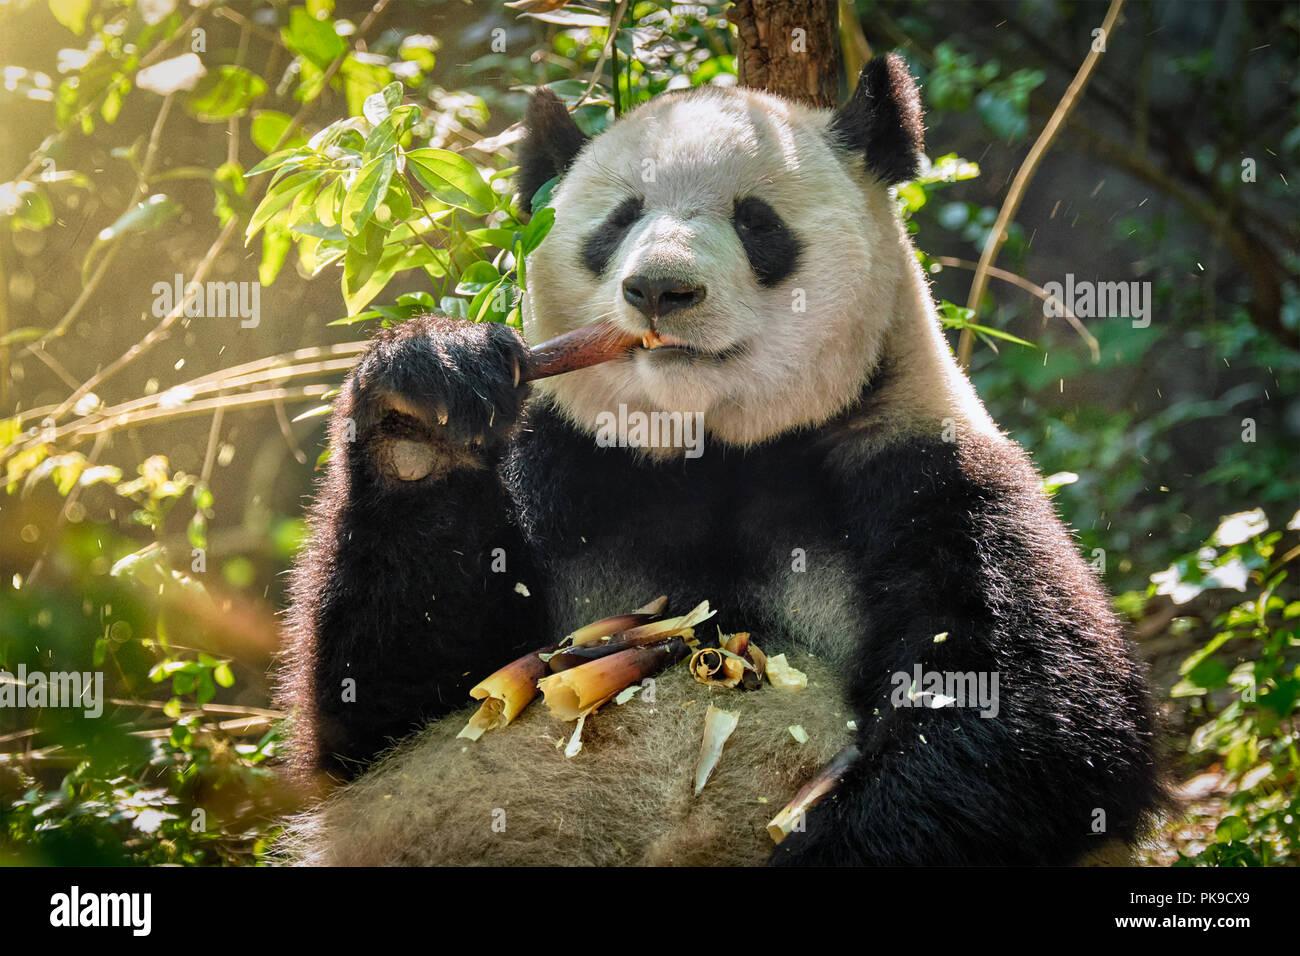 Panda Bären in China Stockbild